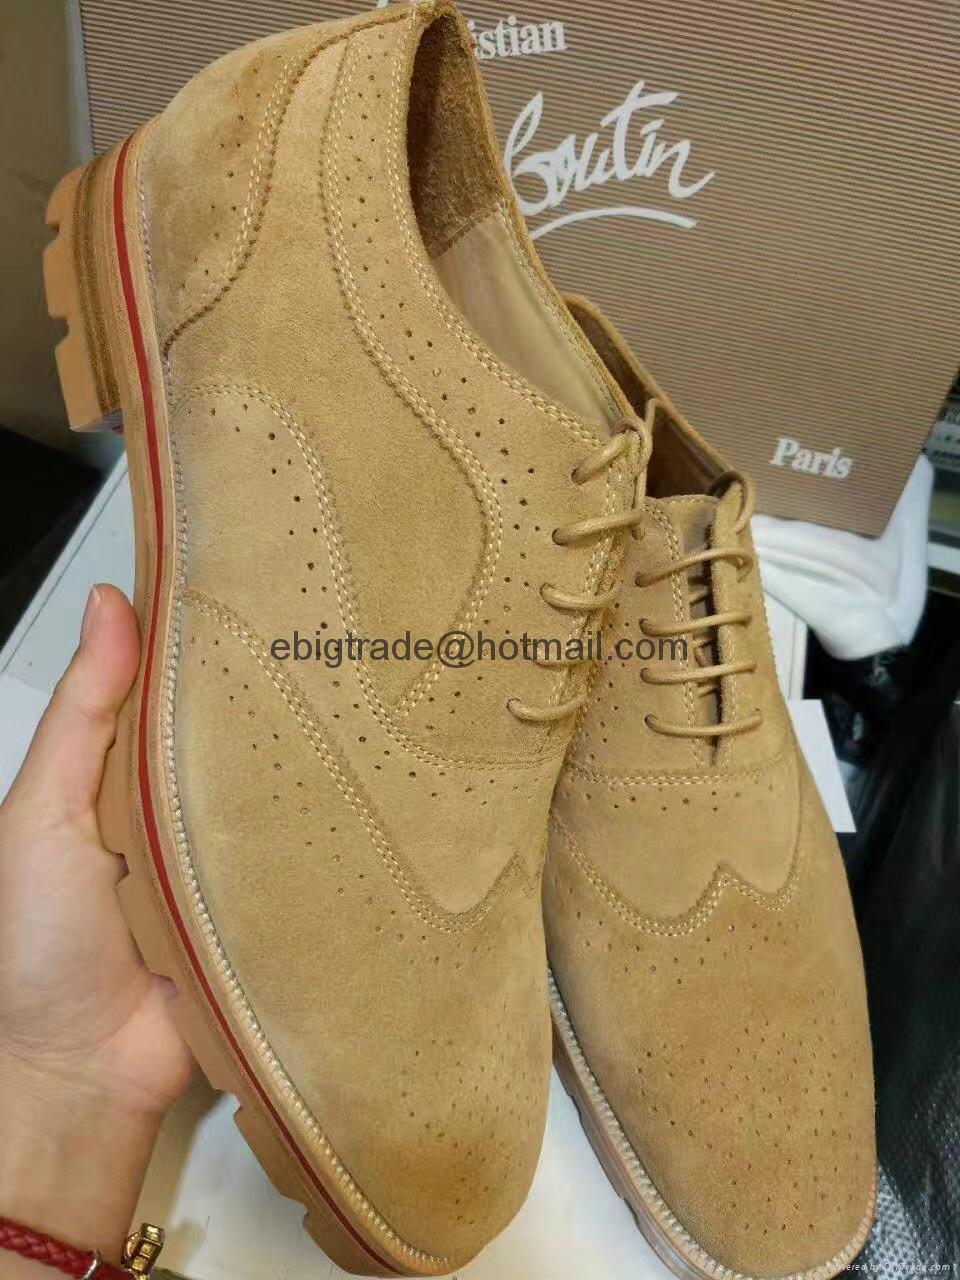 Cheap Christian Louboutin shoes for men christian louboutin sneakers for men 14